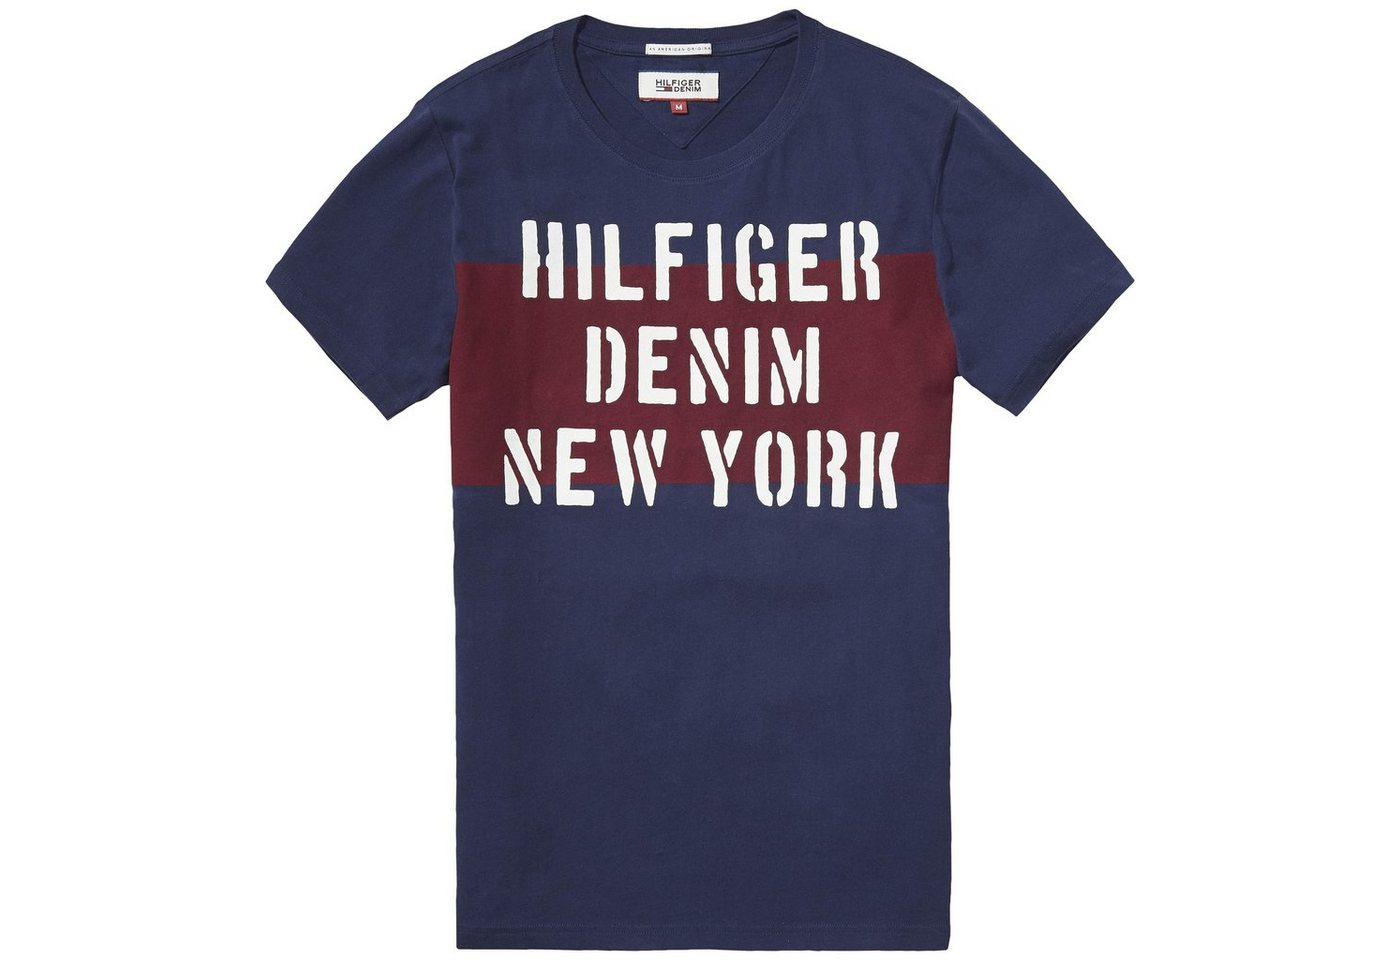 hilfiger denim -  T-Shirt (kurzarm) »THDM CN T-SHIRT S/S 19«